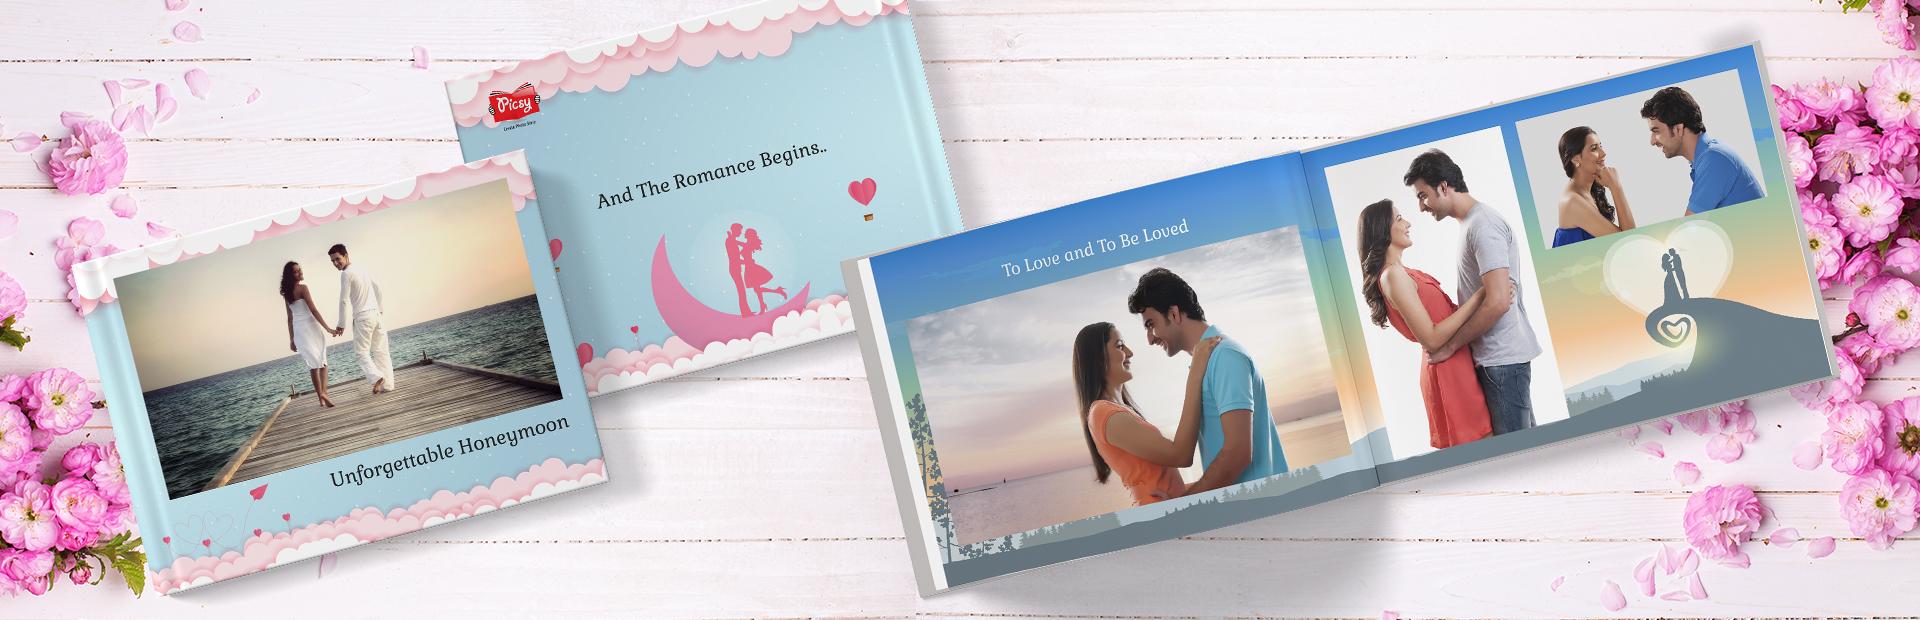 Honeymoon Memories Photo Books Online